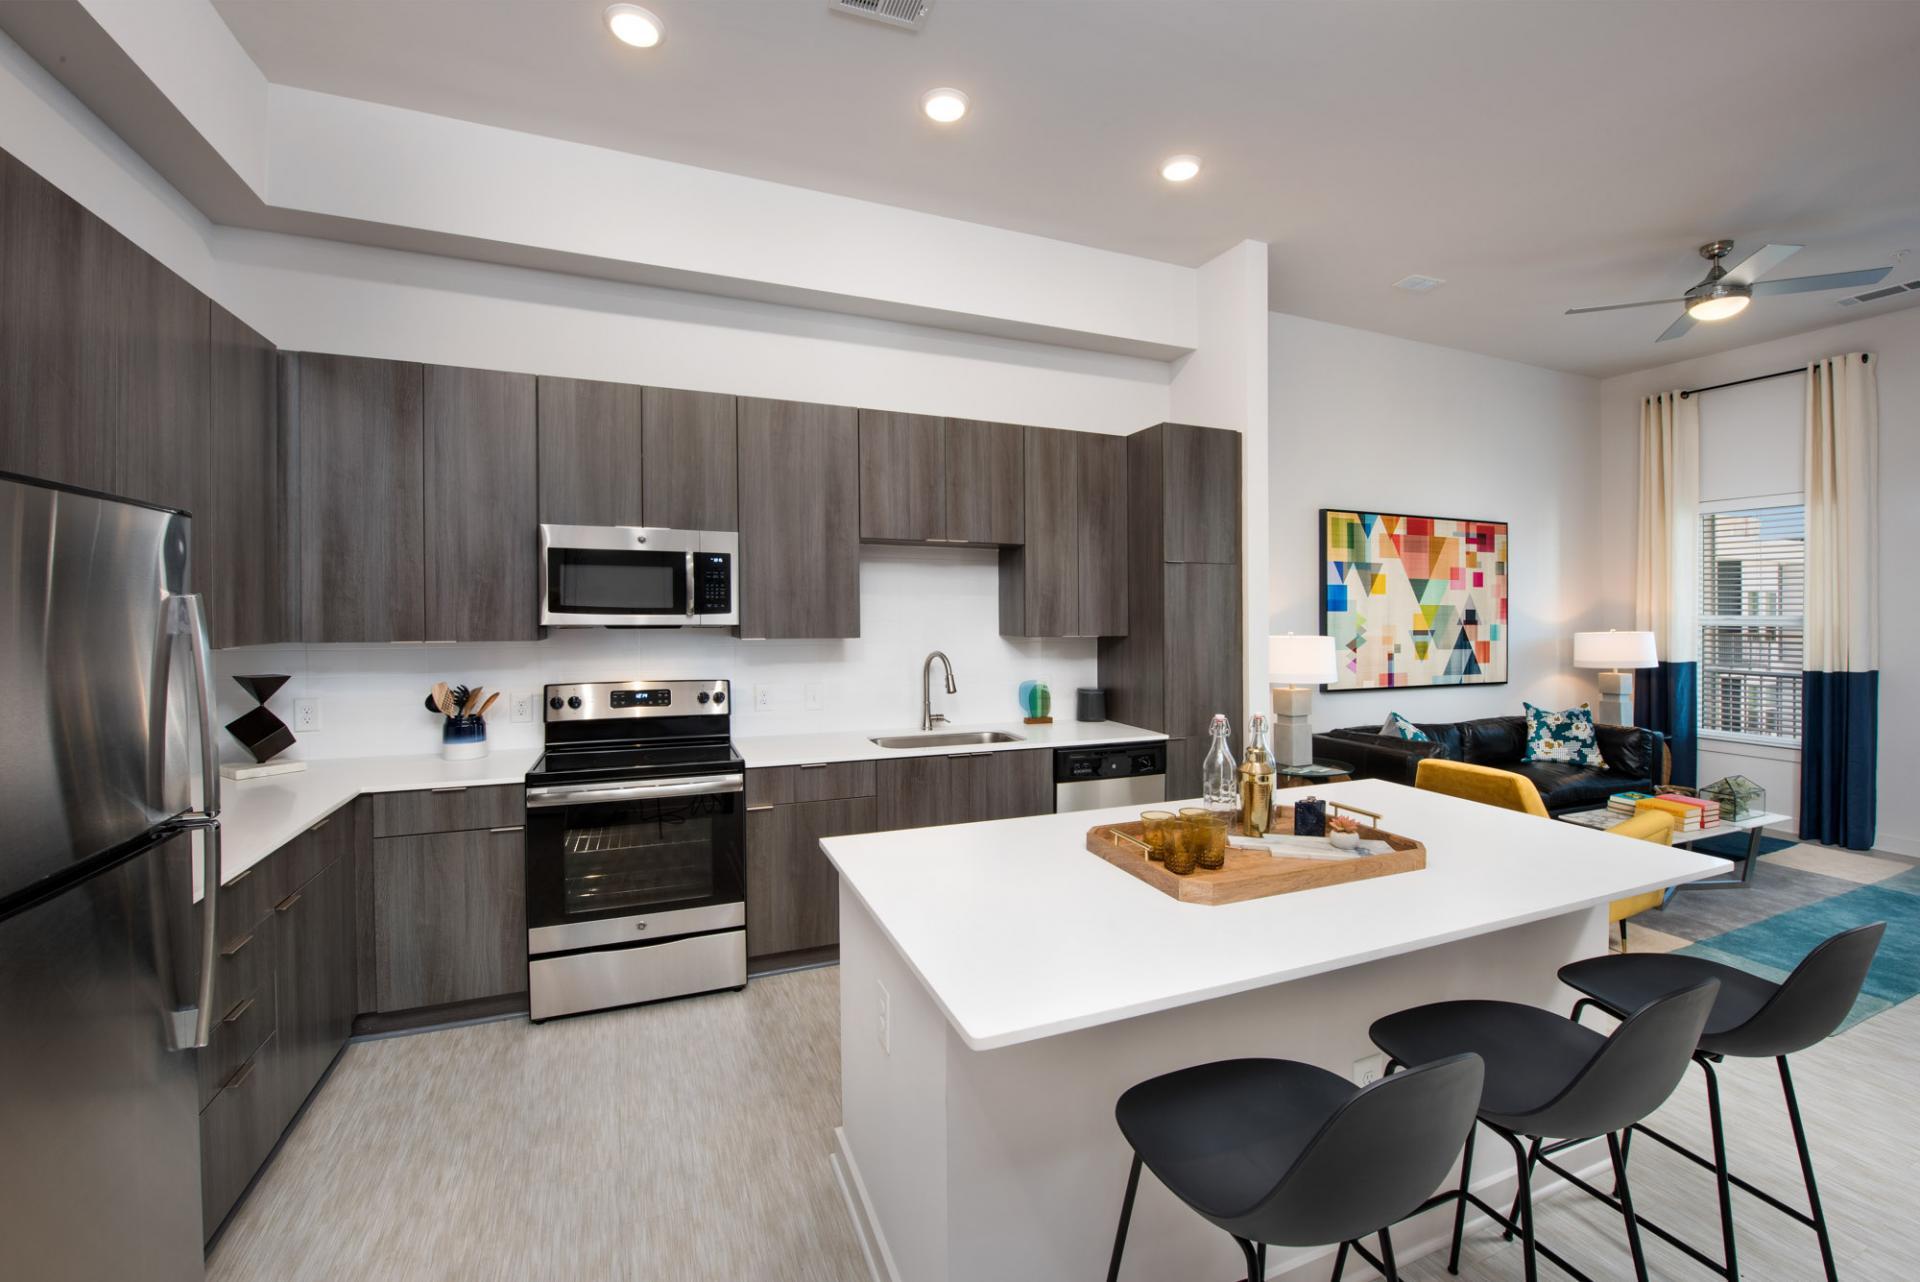 Kitchen at Spectrum on Spring Apartment